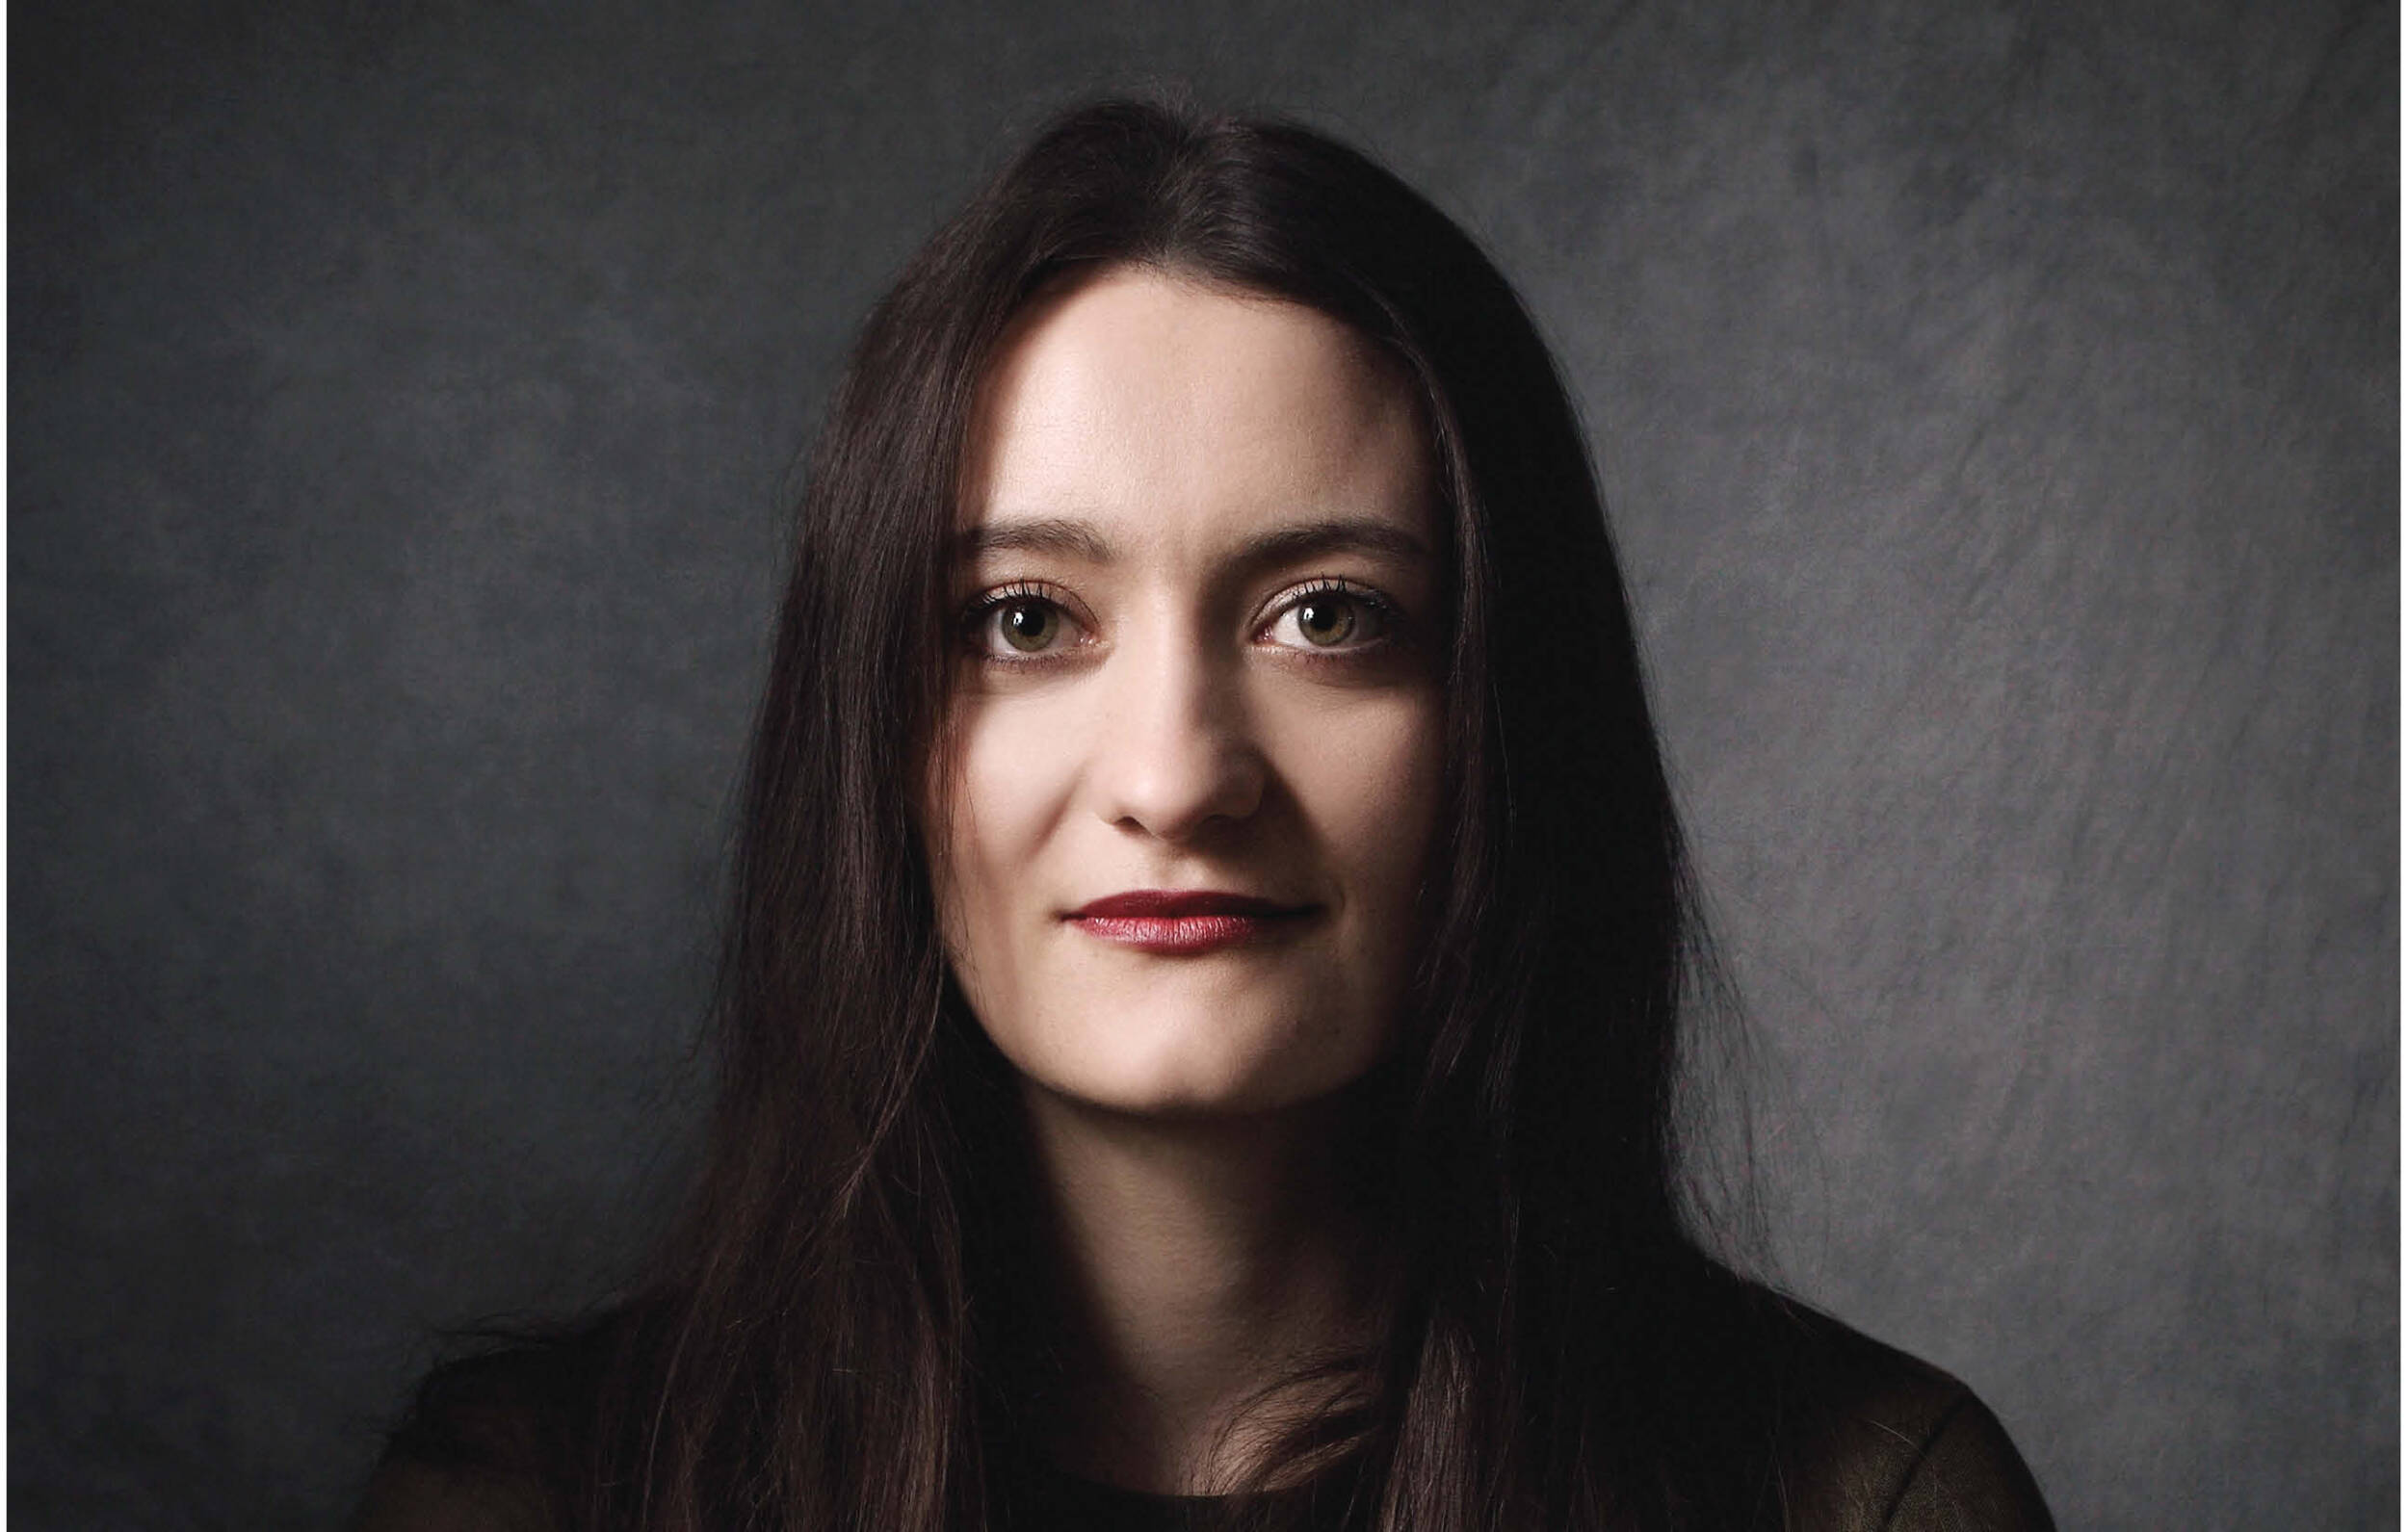 Portrait de Marianna Ladreyt